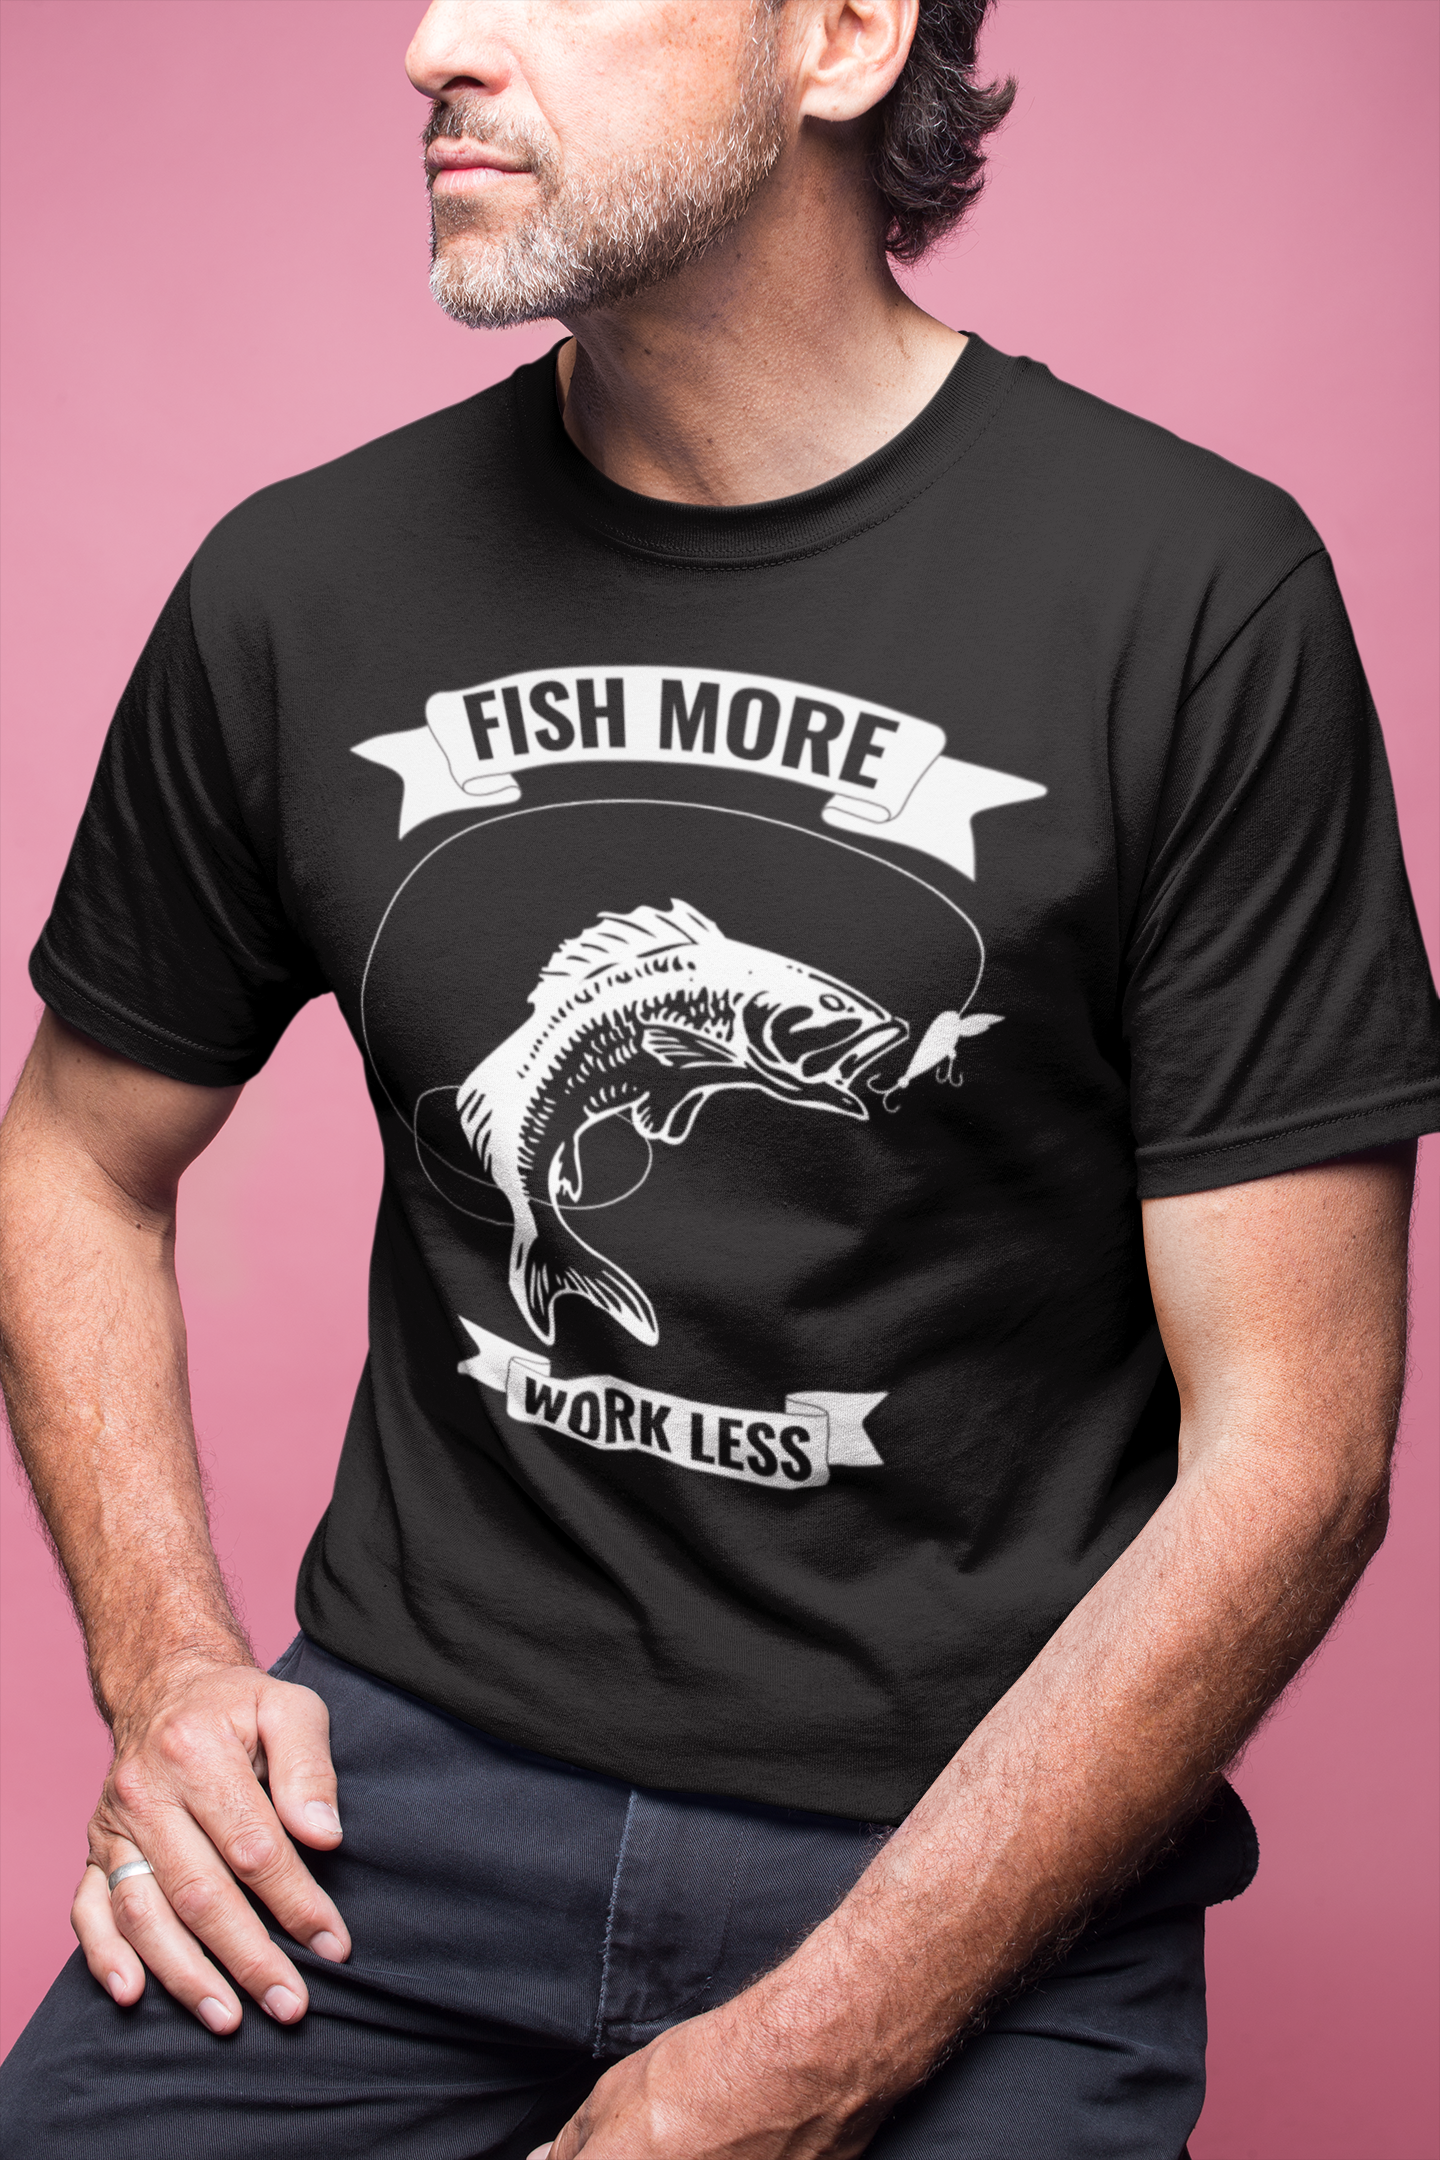 Fly Fishing Shirt For Fisherman Fly Fishing Shirts Fishing Tee Shirts Fishing Shirts